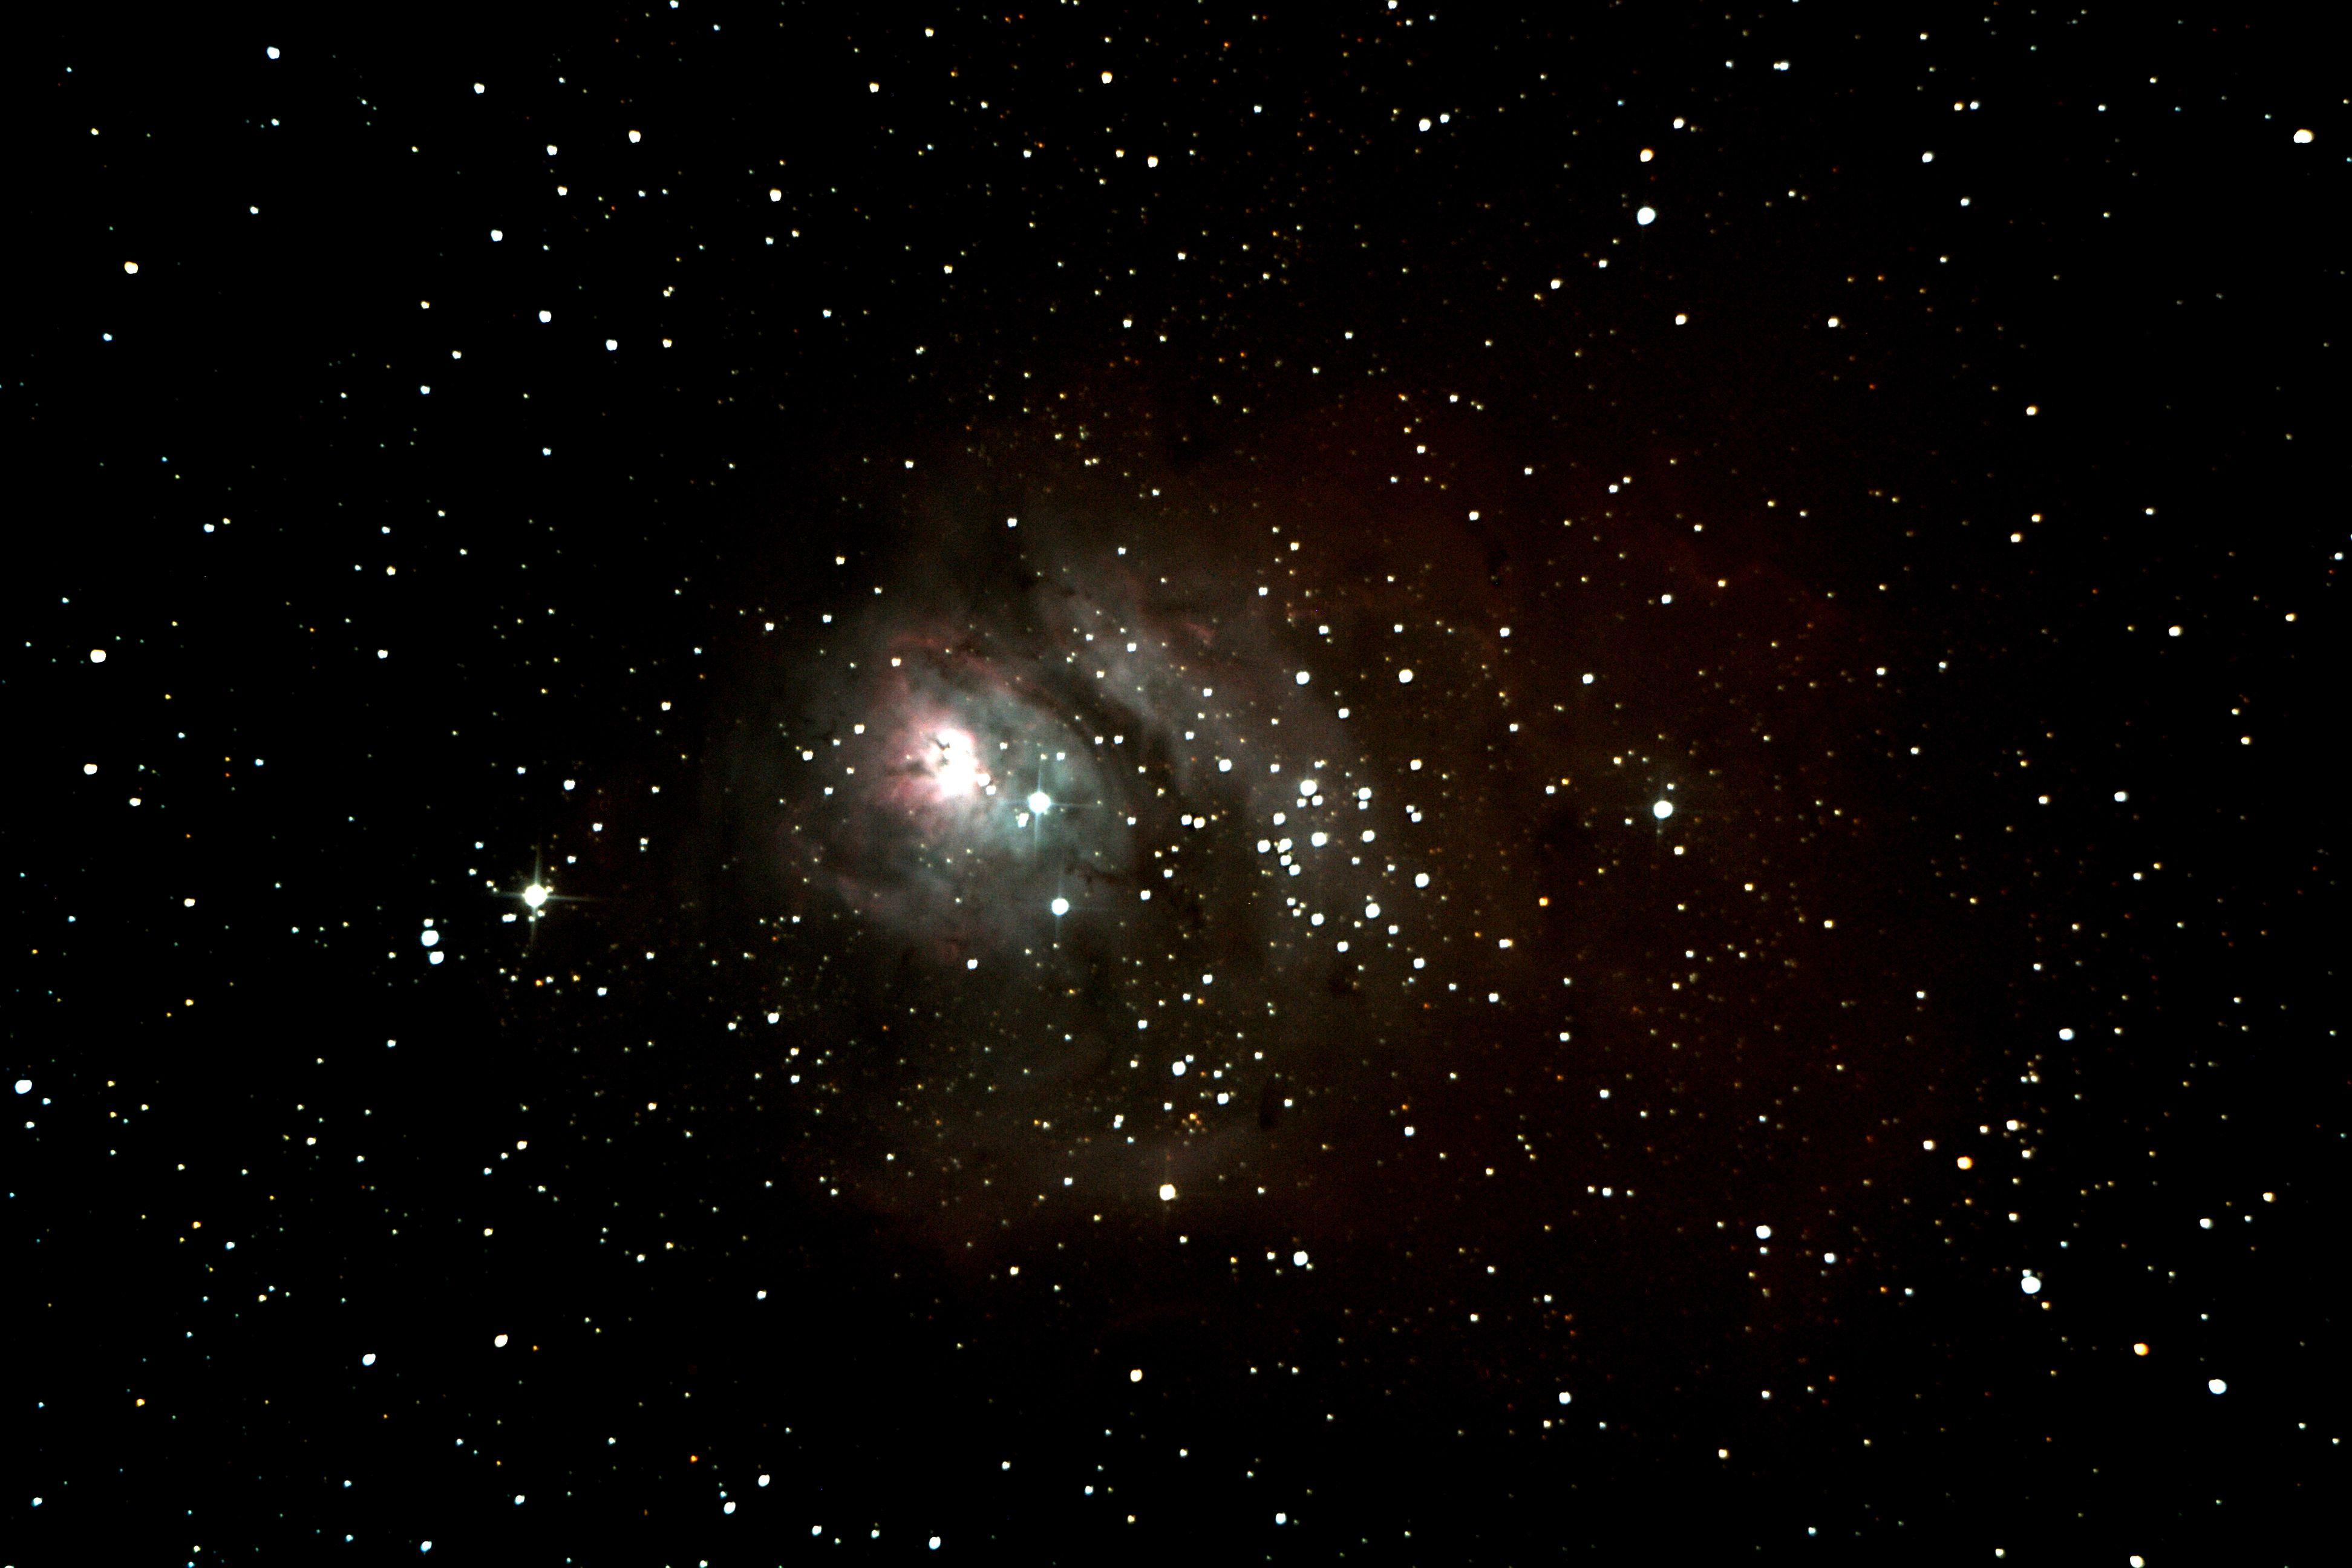 omega nebula 8 inch telescope - HD3888×2592